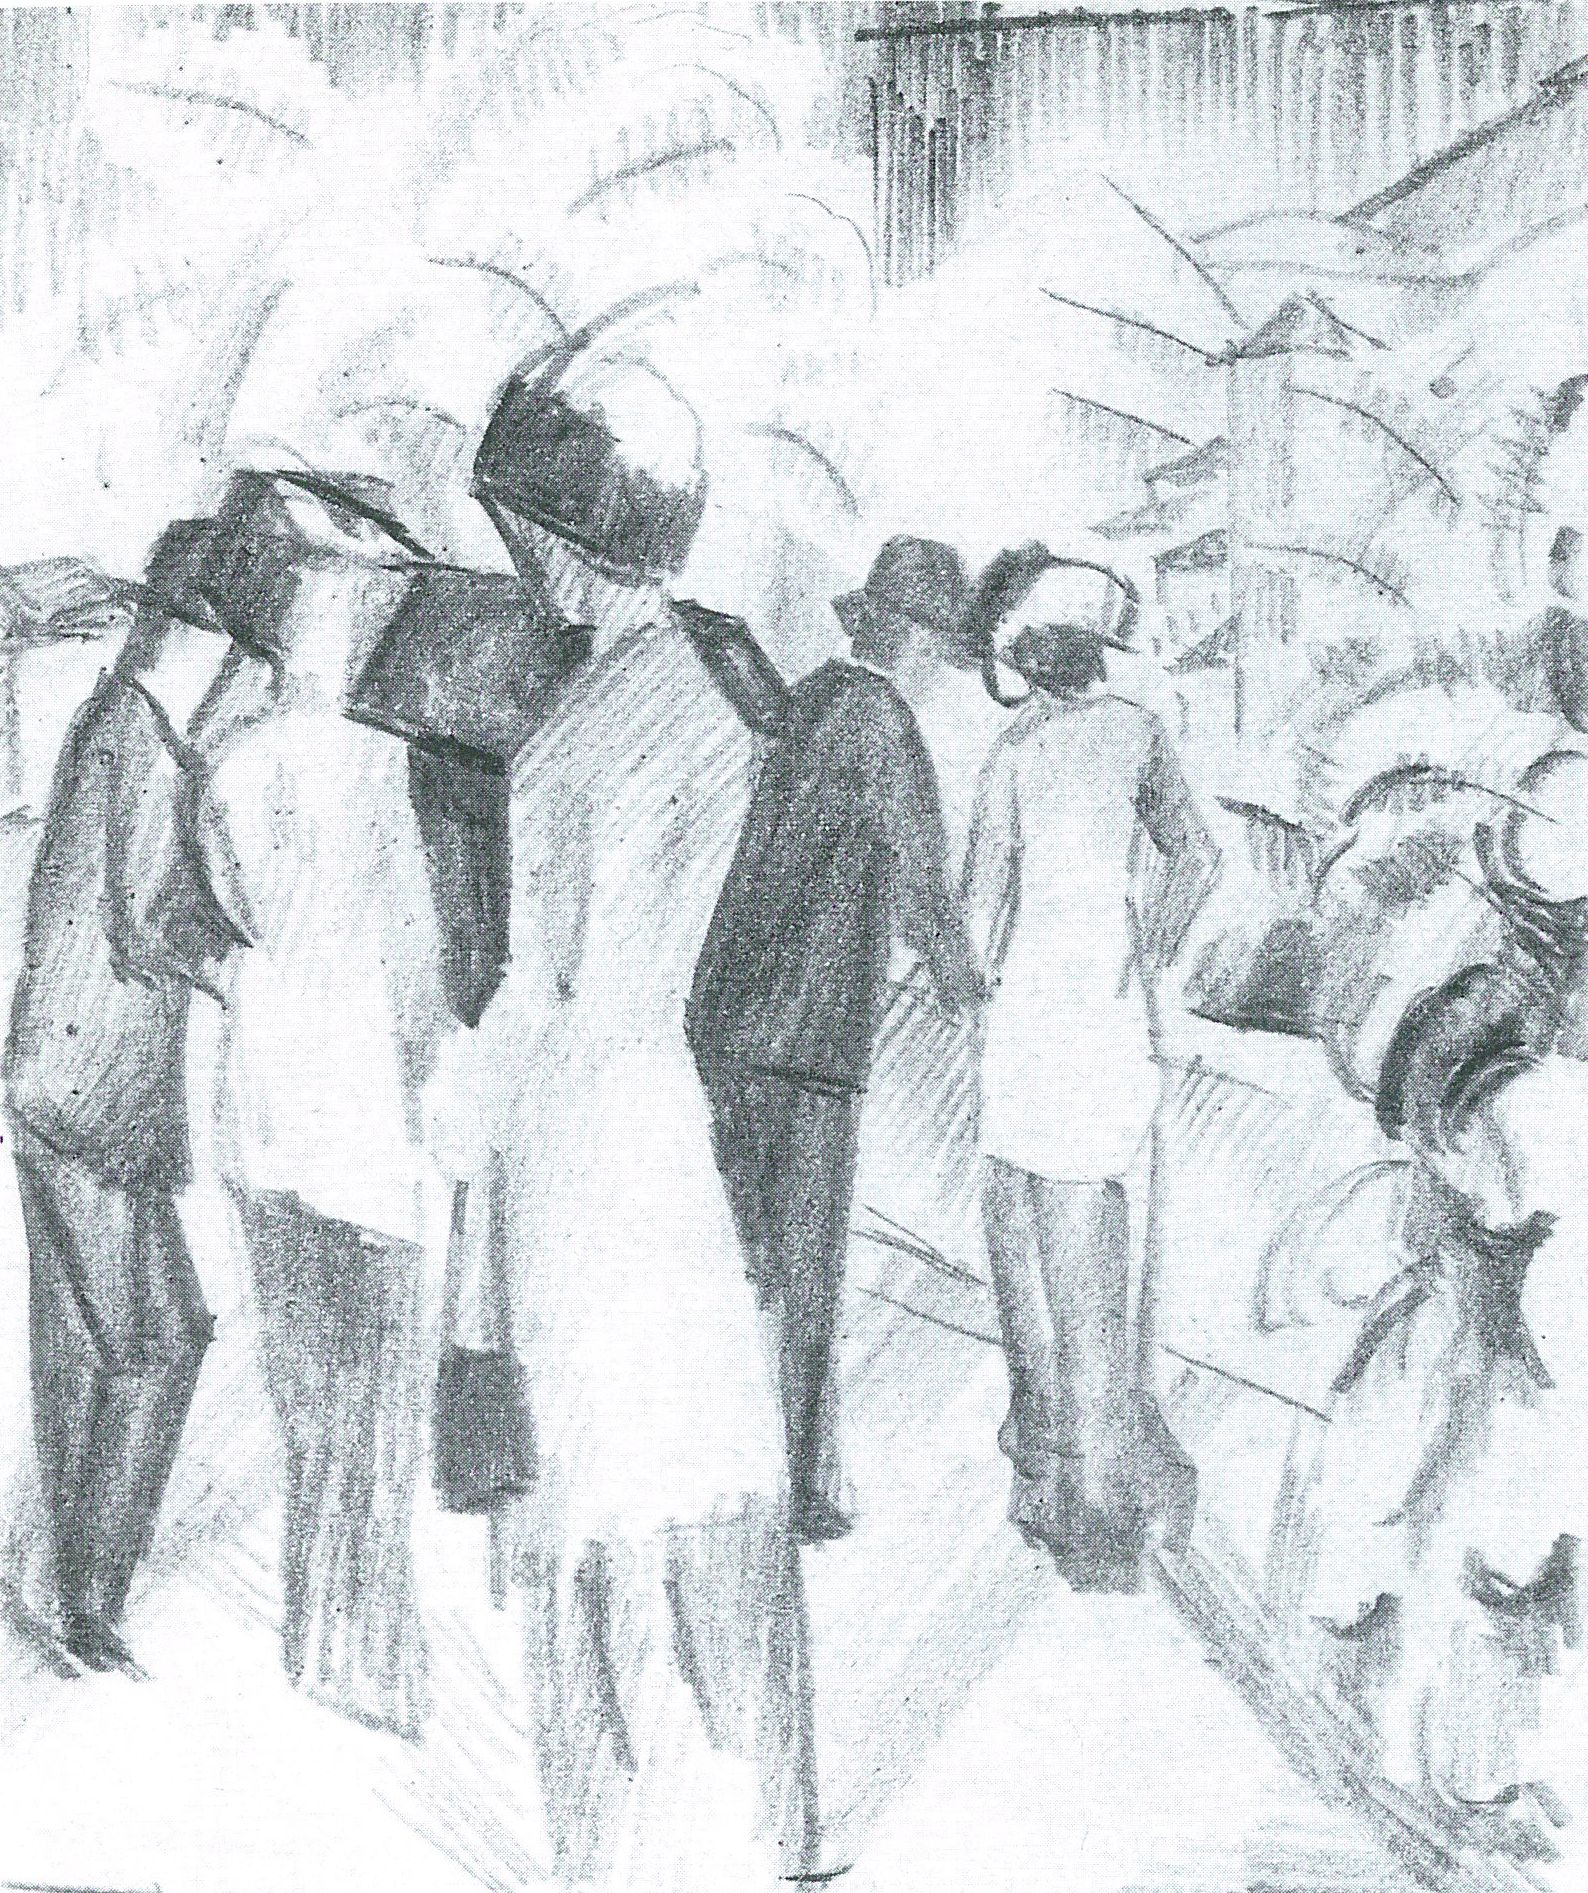 Macke, August: Dame in grüner Jacke (Skizze zum Bild)